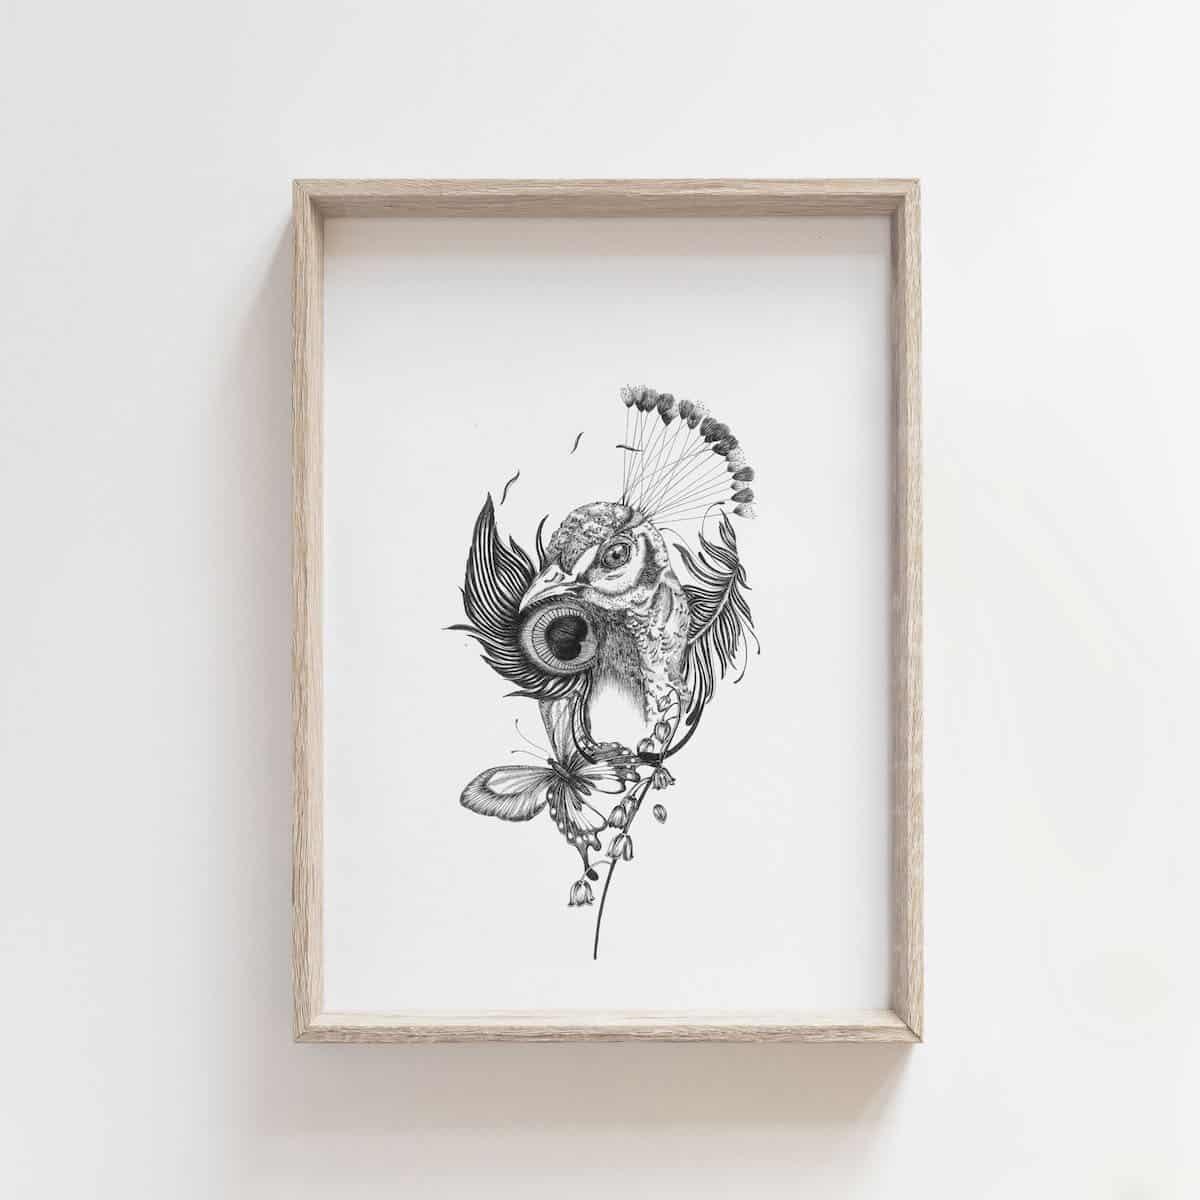 Weeds And Flowers – By Jocelin Meredith Artwork